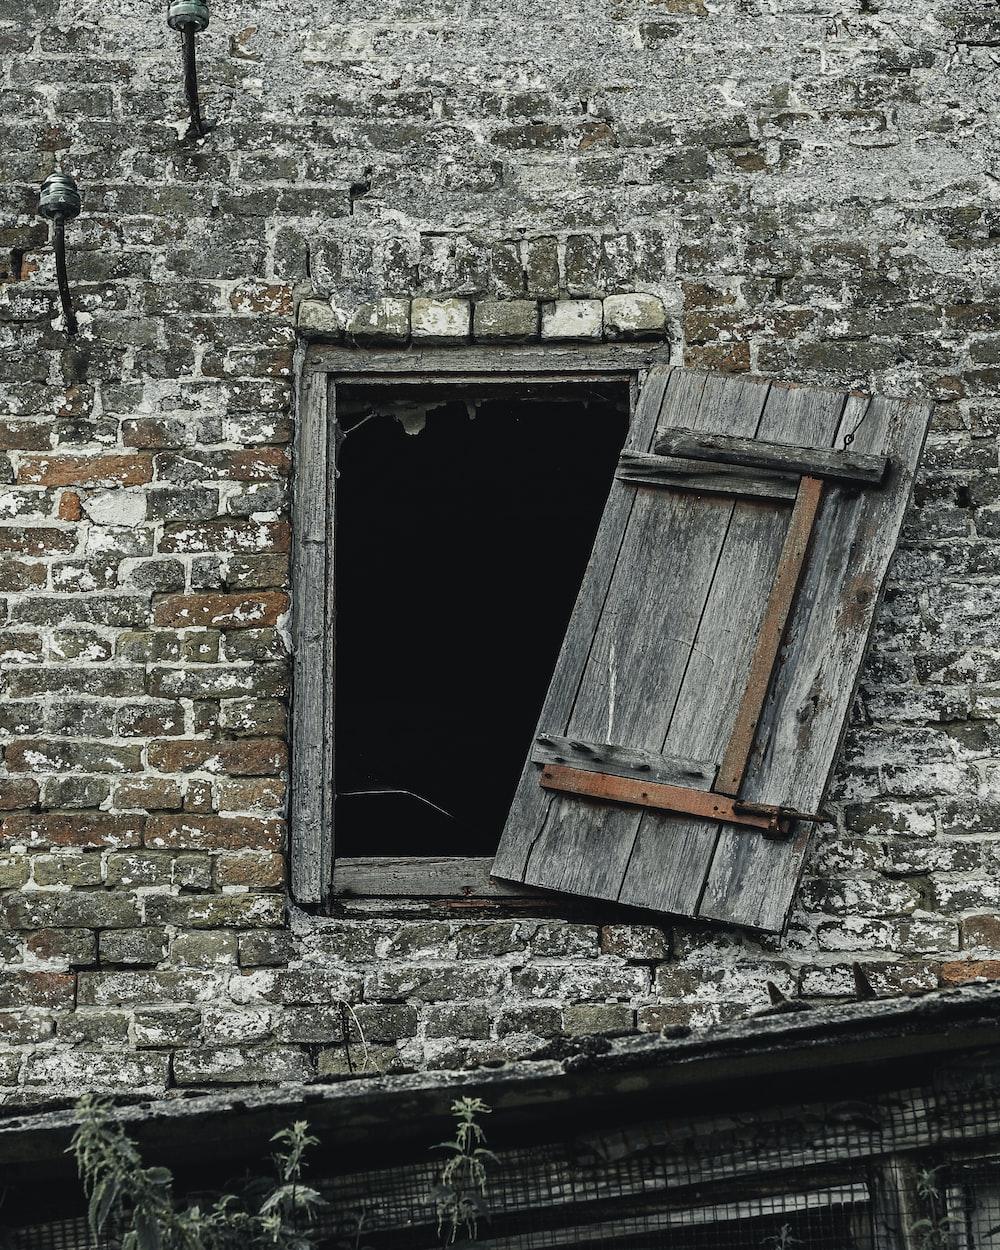 gray stone building showing open grey wooden window